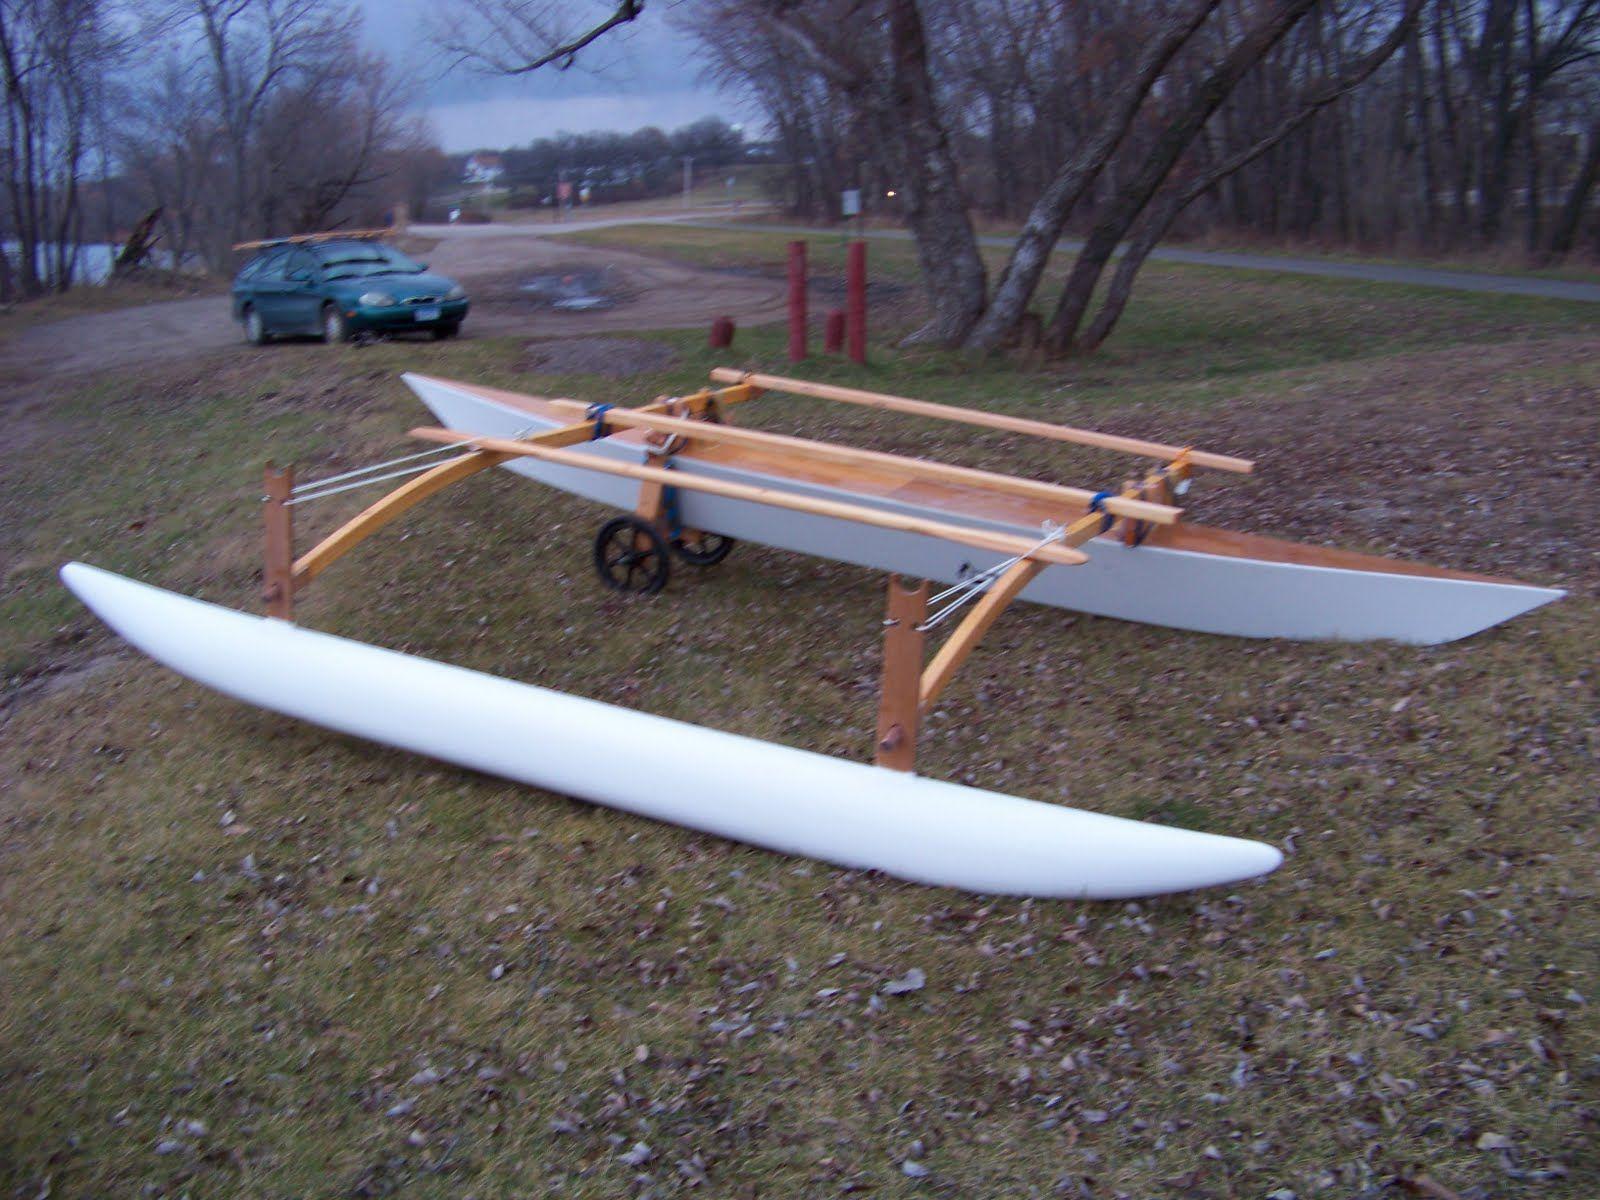 C Lion Outrigger Canoe Doug Weir's Proa Proje...